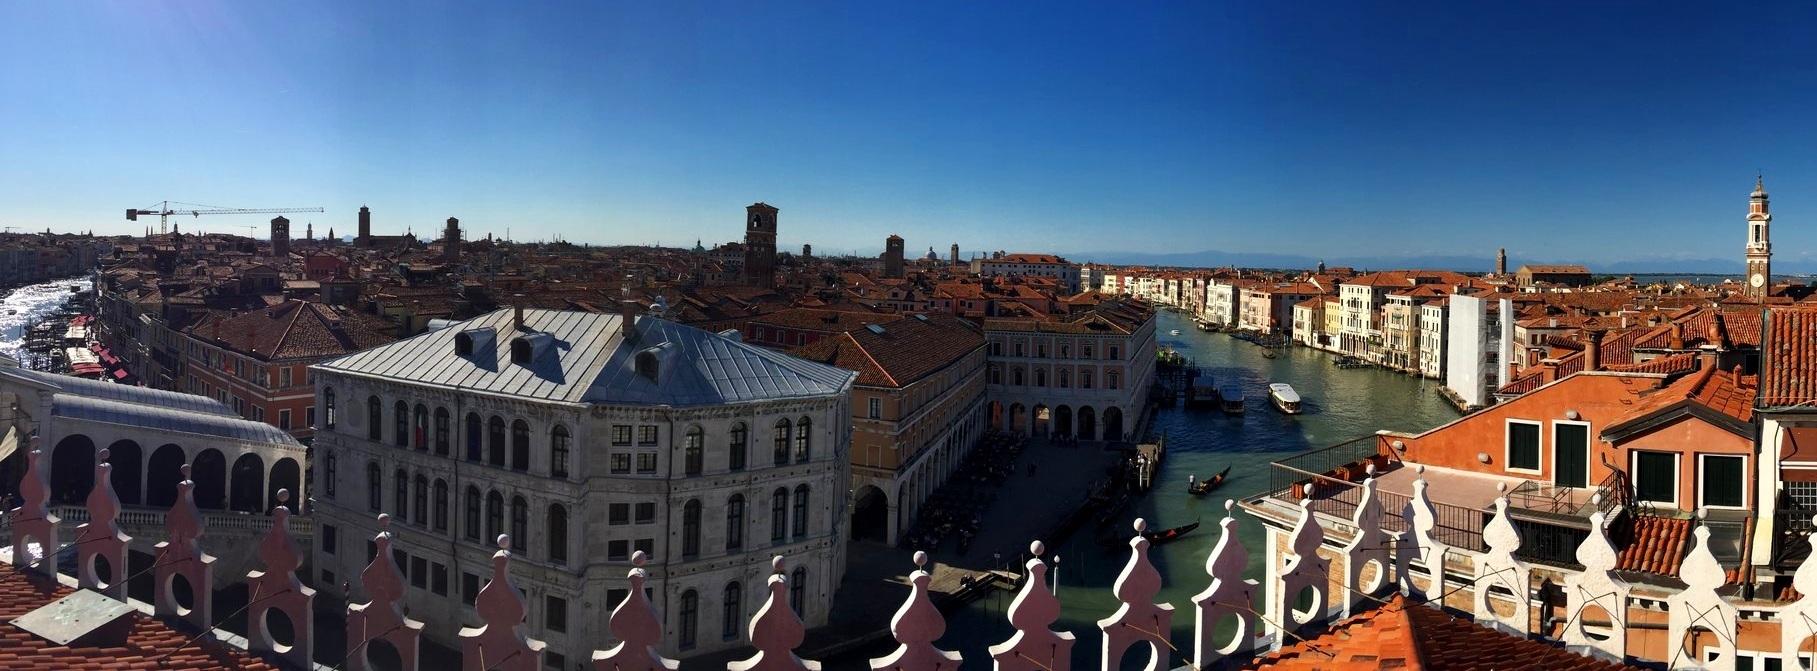 Skyline of Venice, Grand Canal and Rialto Bridge - Fondaco dei Tedeschi